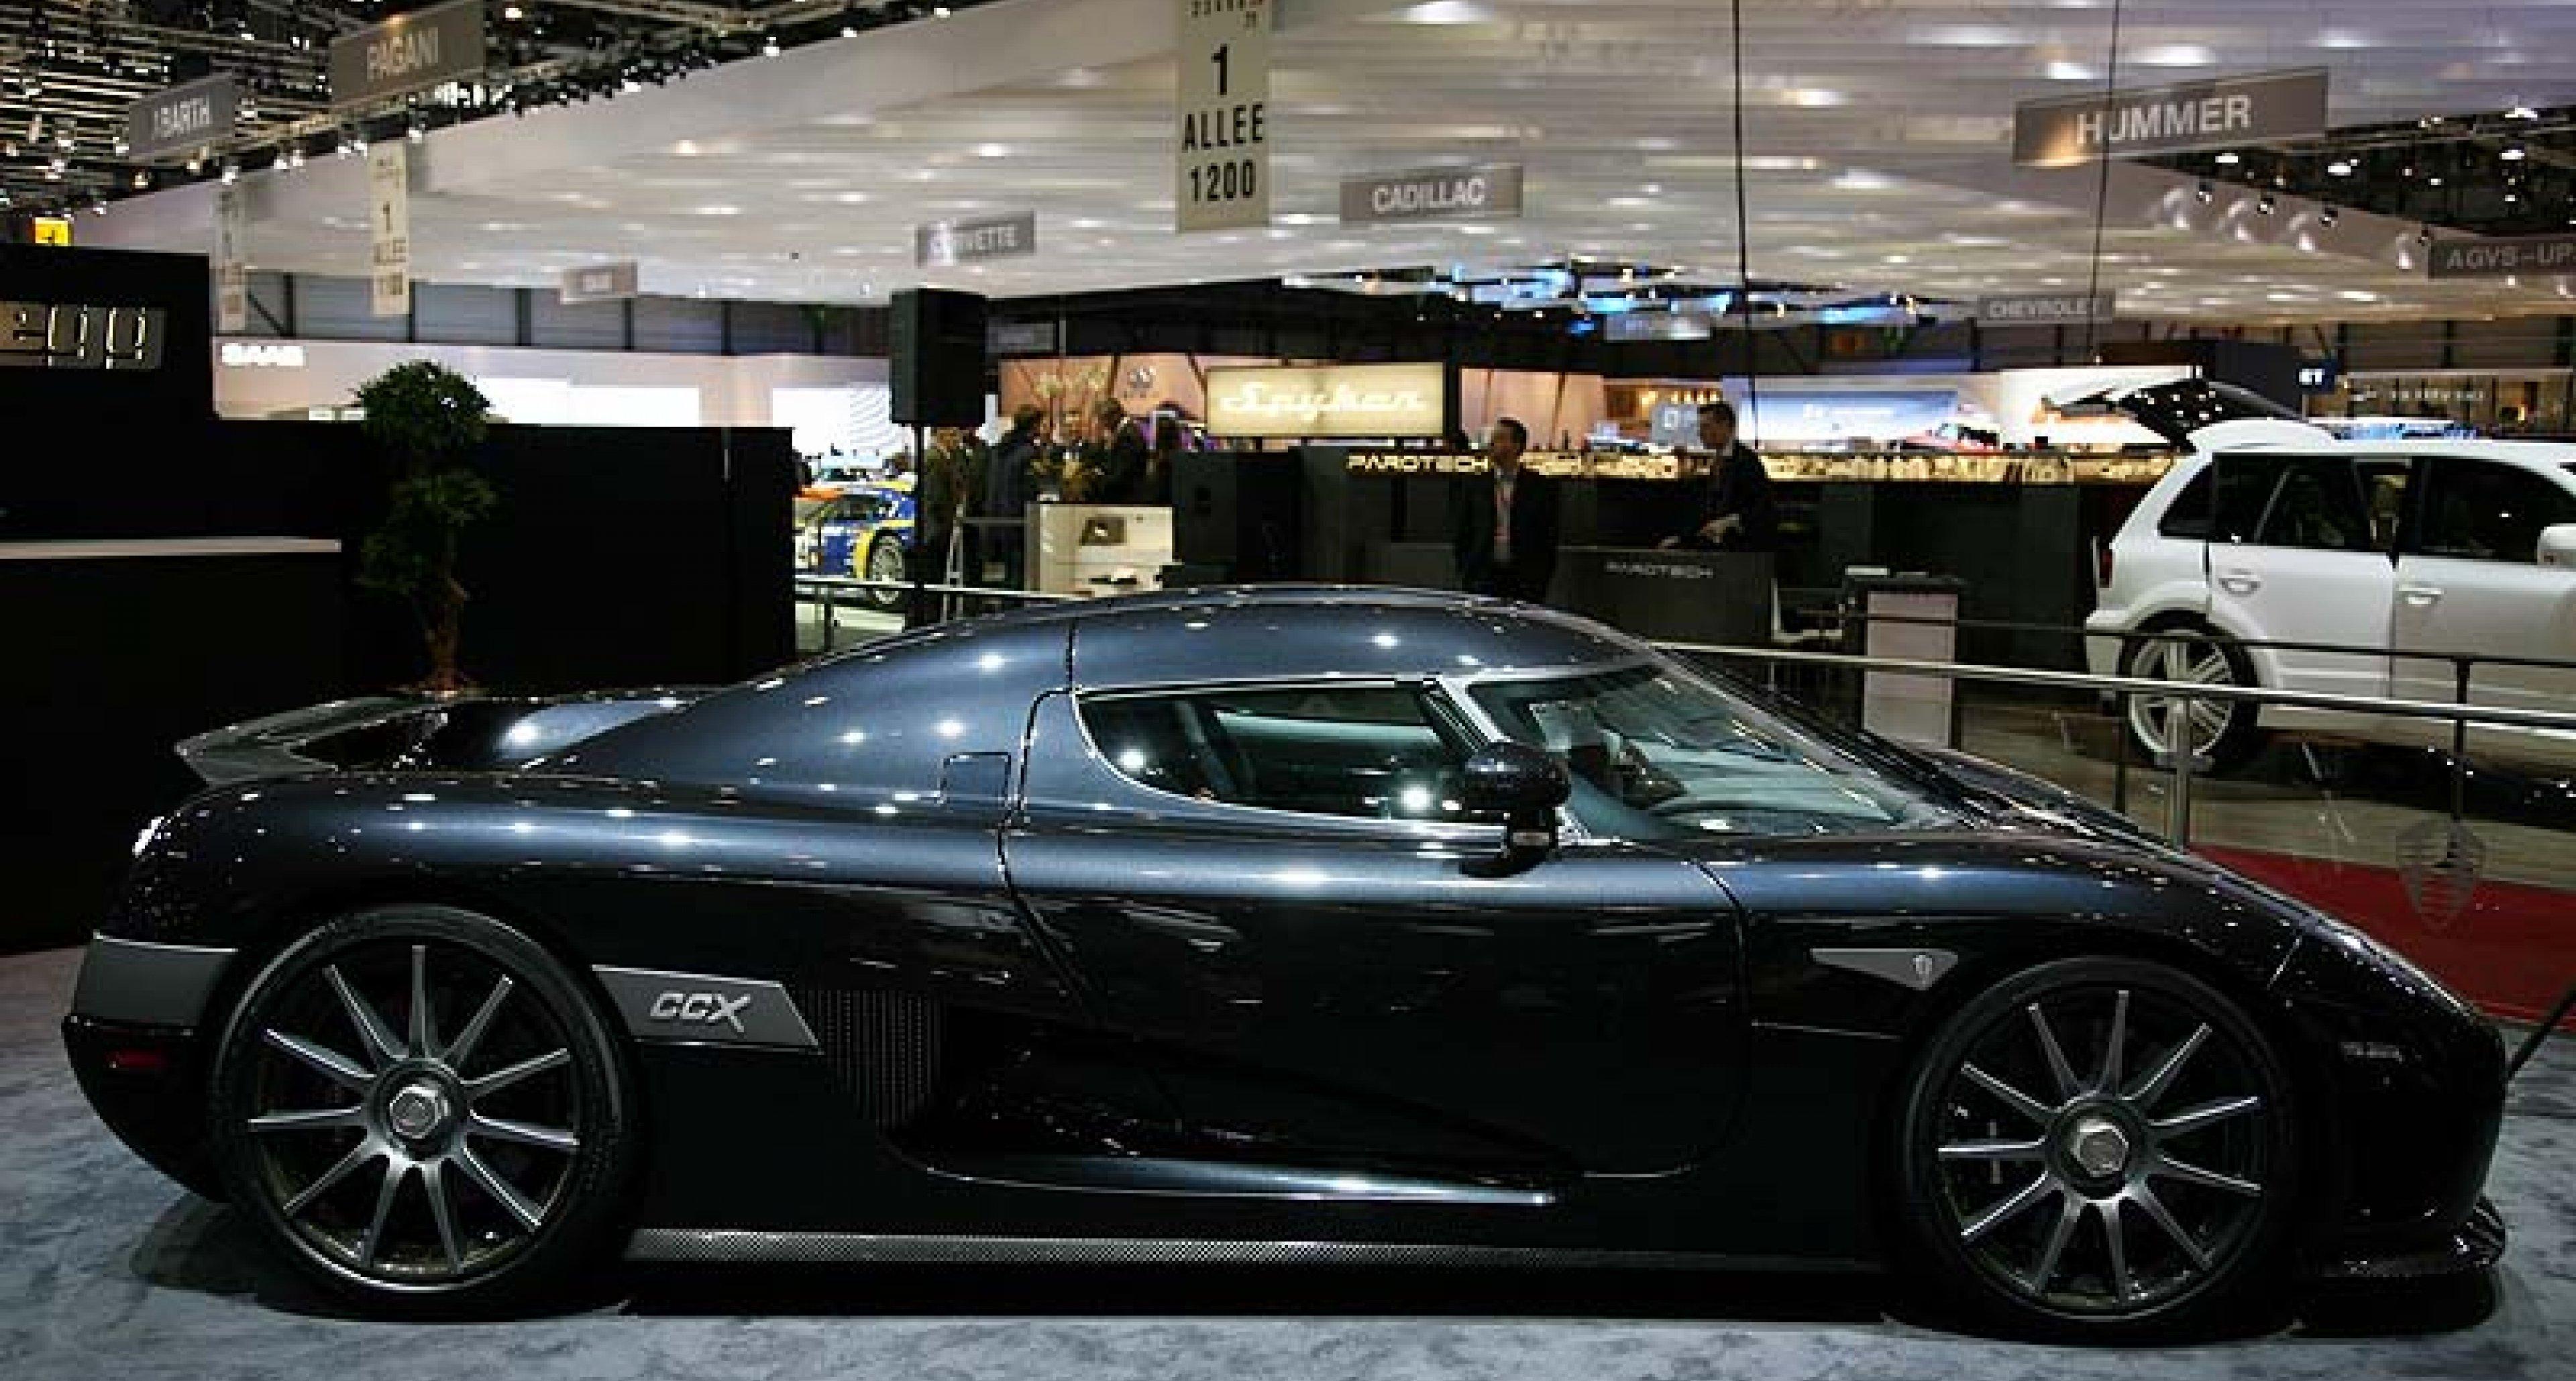 Geneva International Motor Show 2008